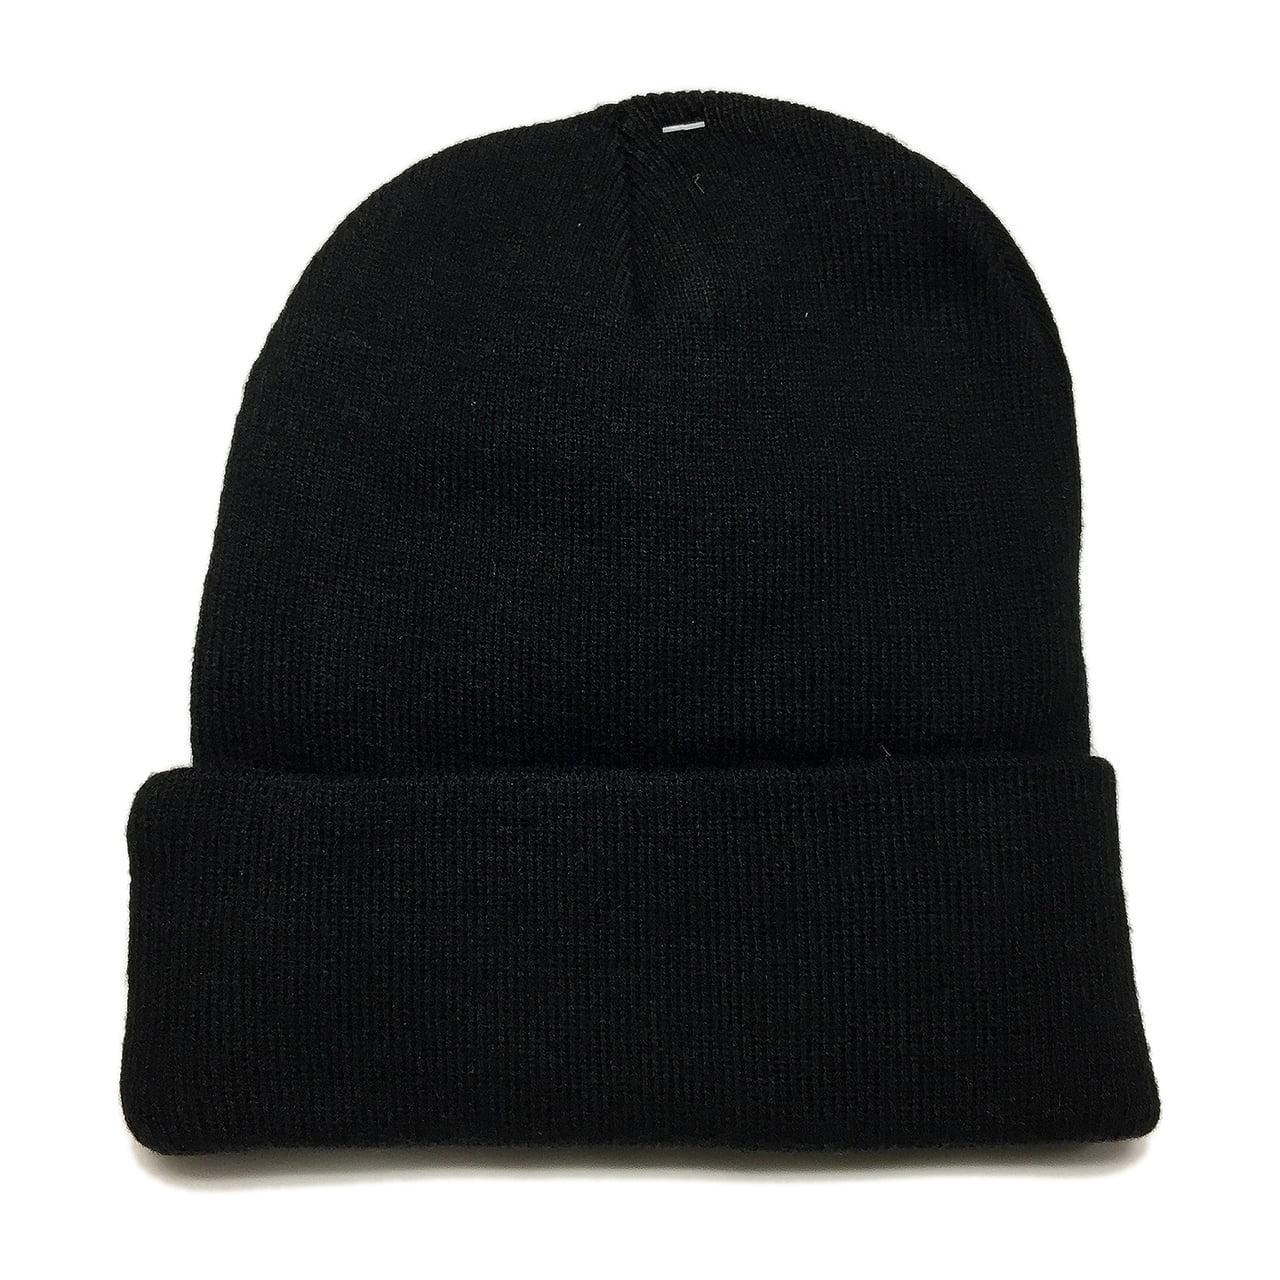 U.S. Military U.S. ARMY 3RD INFANTRY DIVISION Black Knit Long Beanie Hat  Cap - Walmart.com 9e069c2b6e8